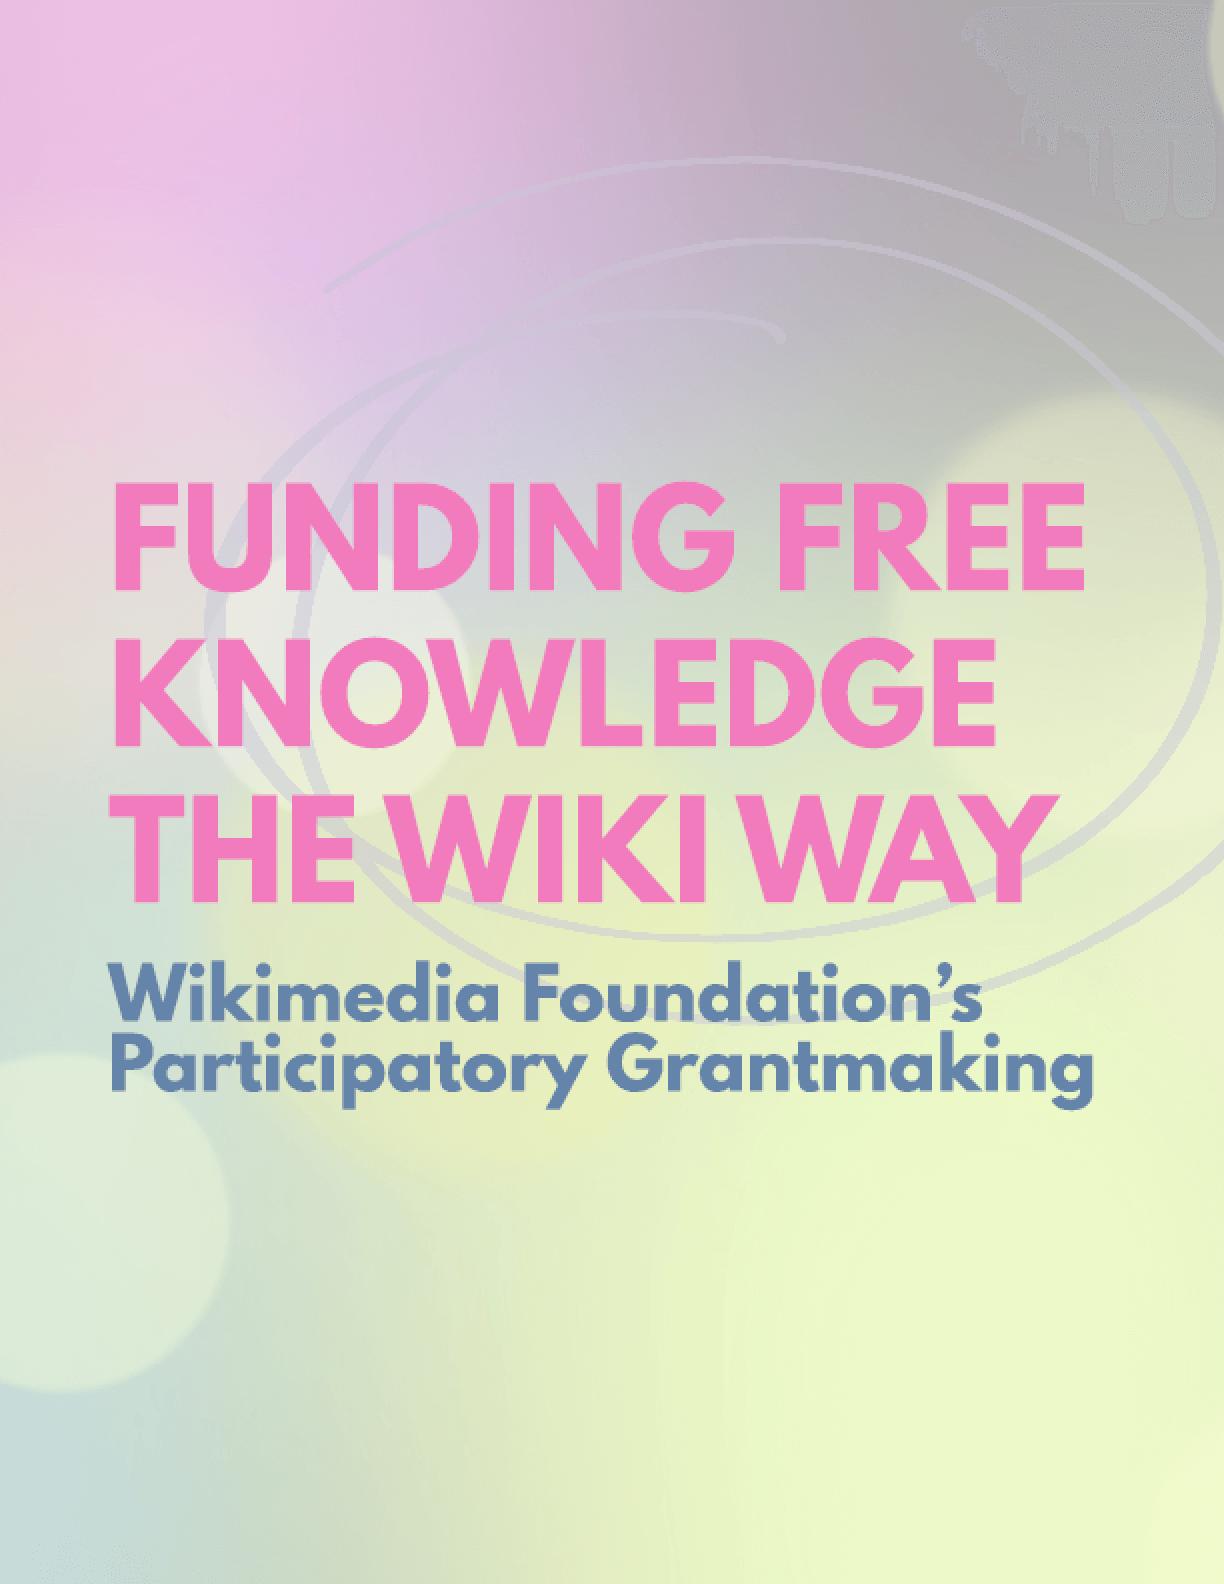 Funding Free Knowledge The Wiki Way : Wikimedia Foundation's Participatory Grantmaking